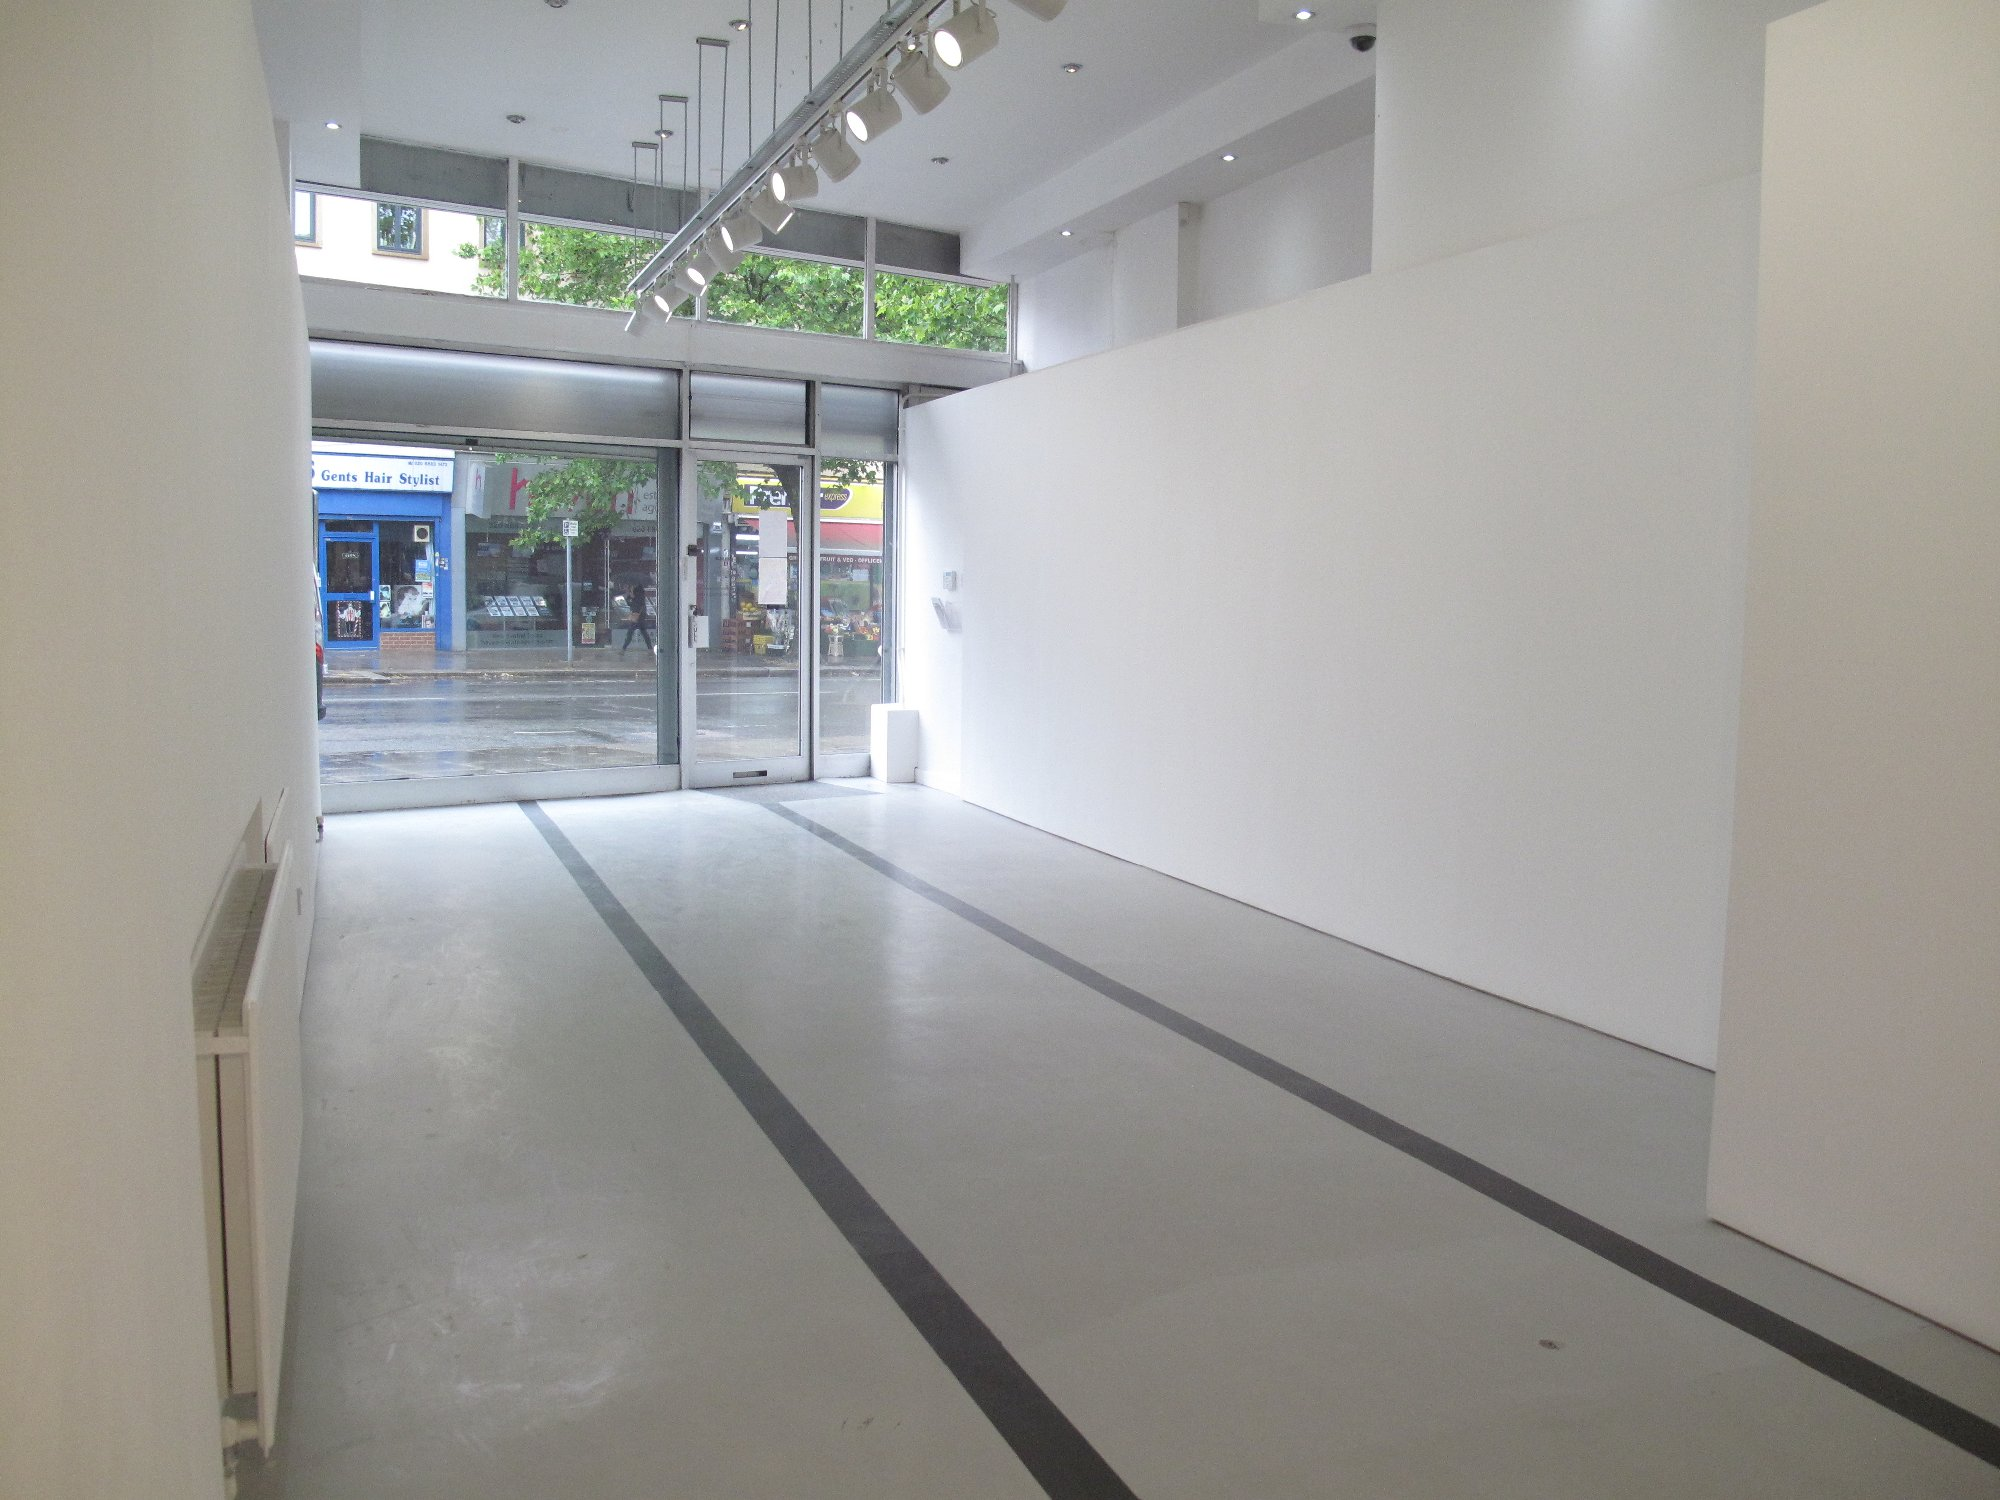 01 - Offshoot Gallery - Front.JPG